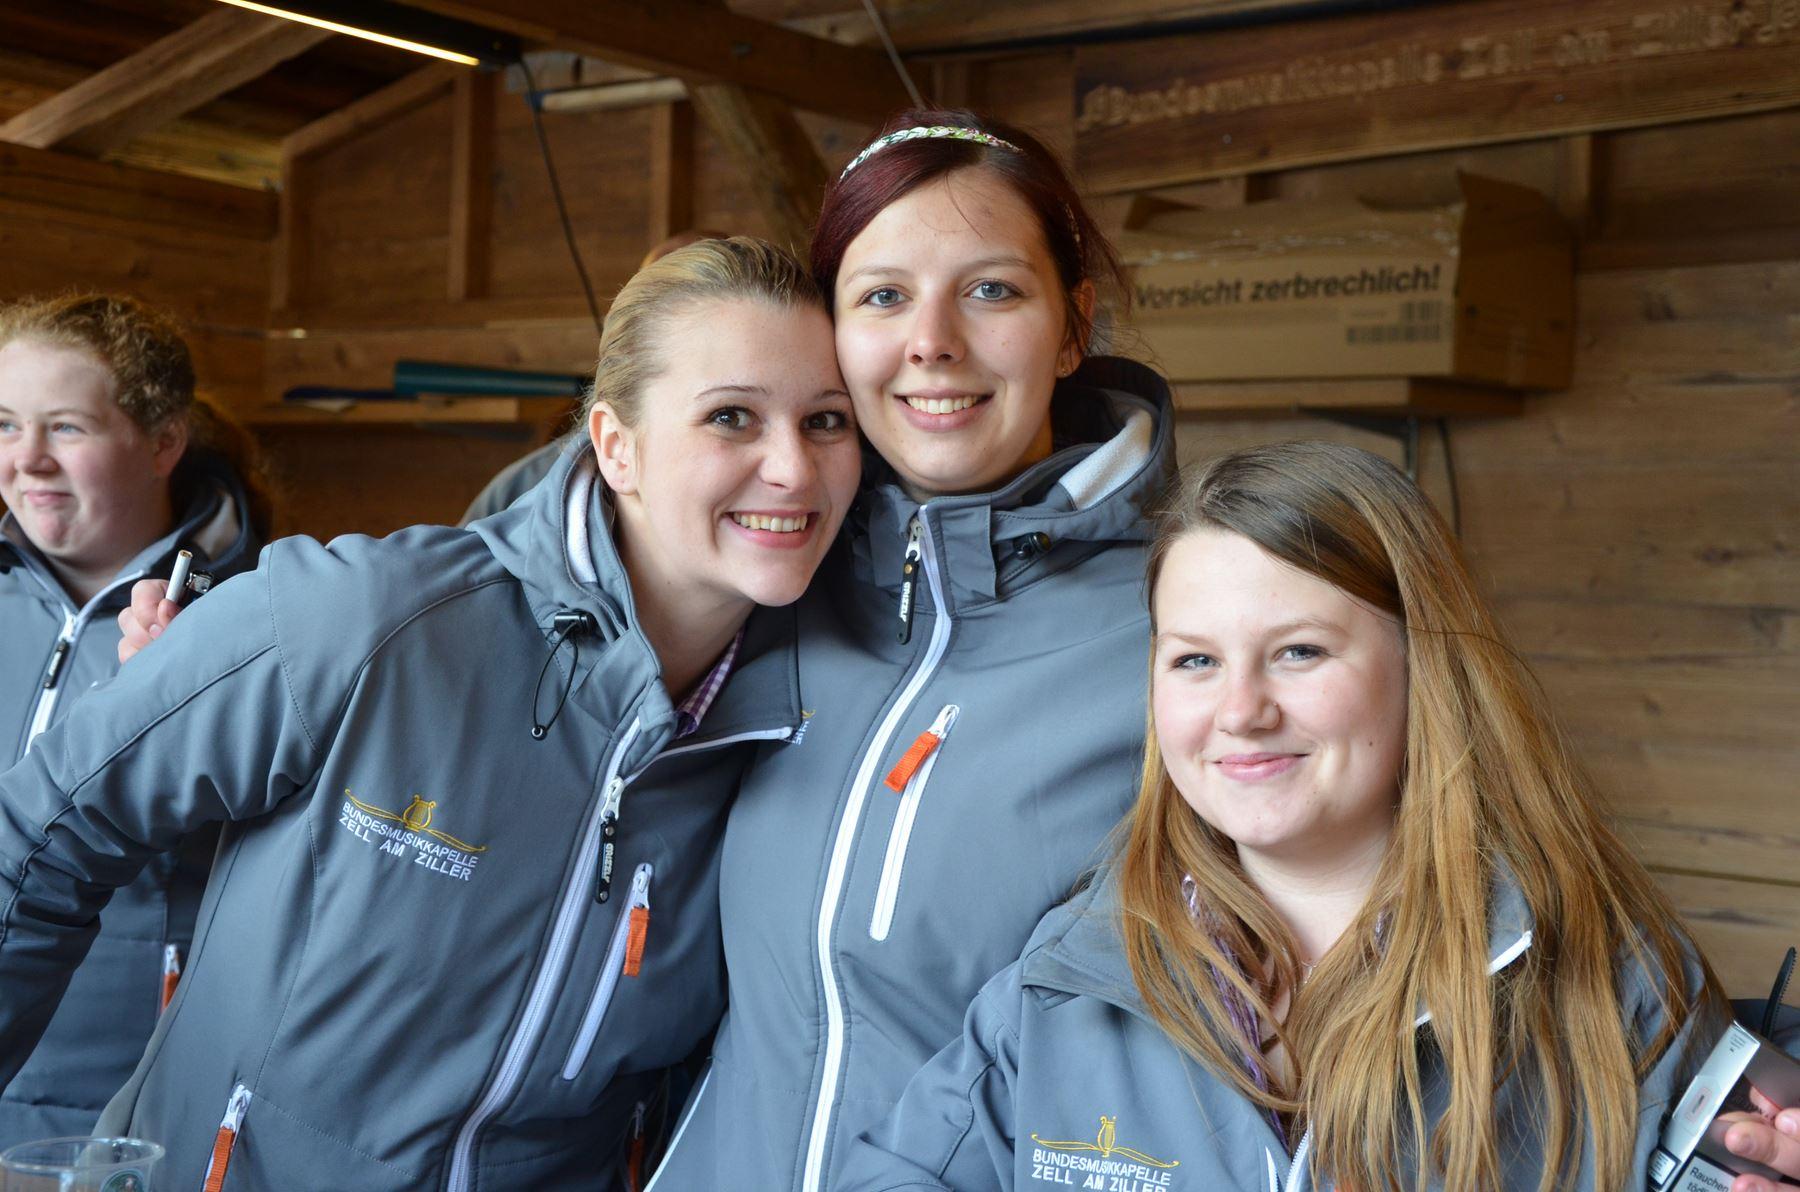 2015-03-22 BV Zillertal Skirennen 333.JPG